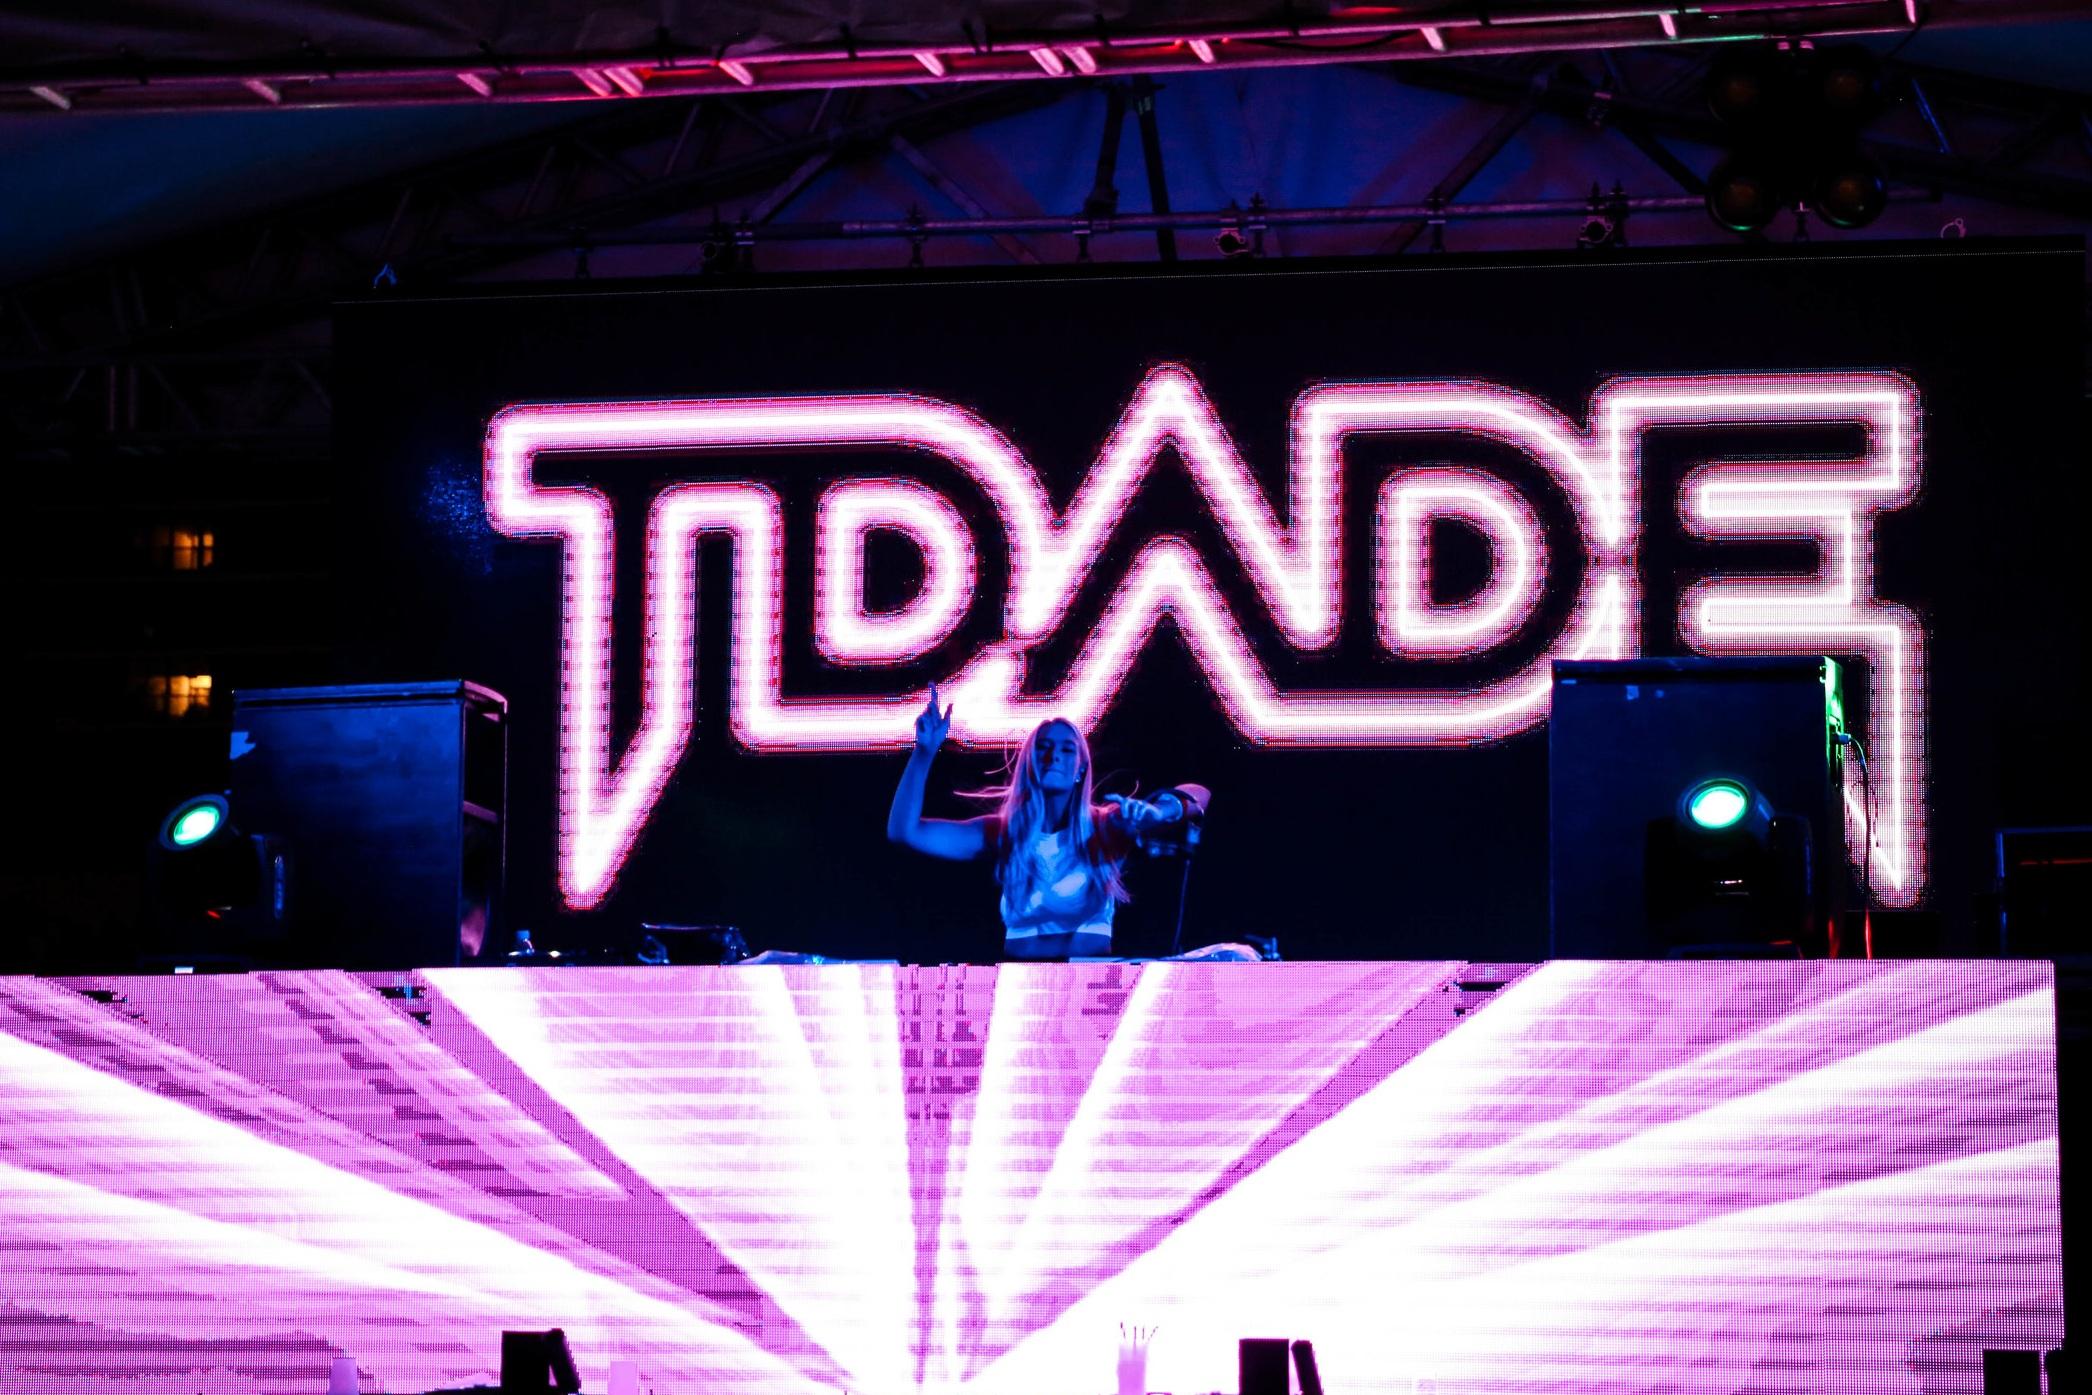 1+-+TDade+SLS+Brickell+Miami+FL+Tricia+Dade+DJ+T.Dade-0651+copy+2.jpg